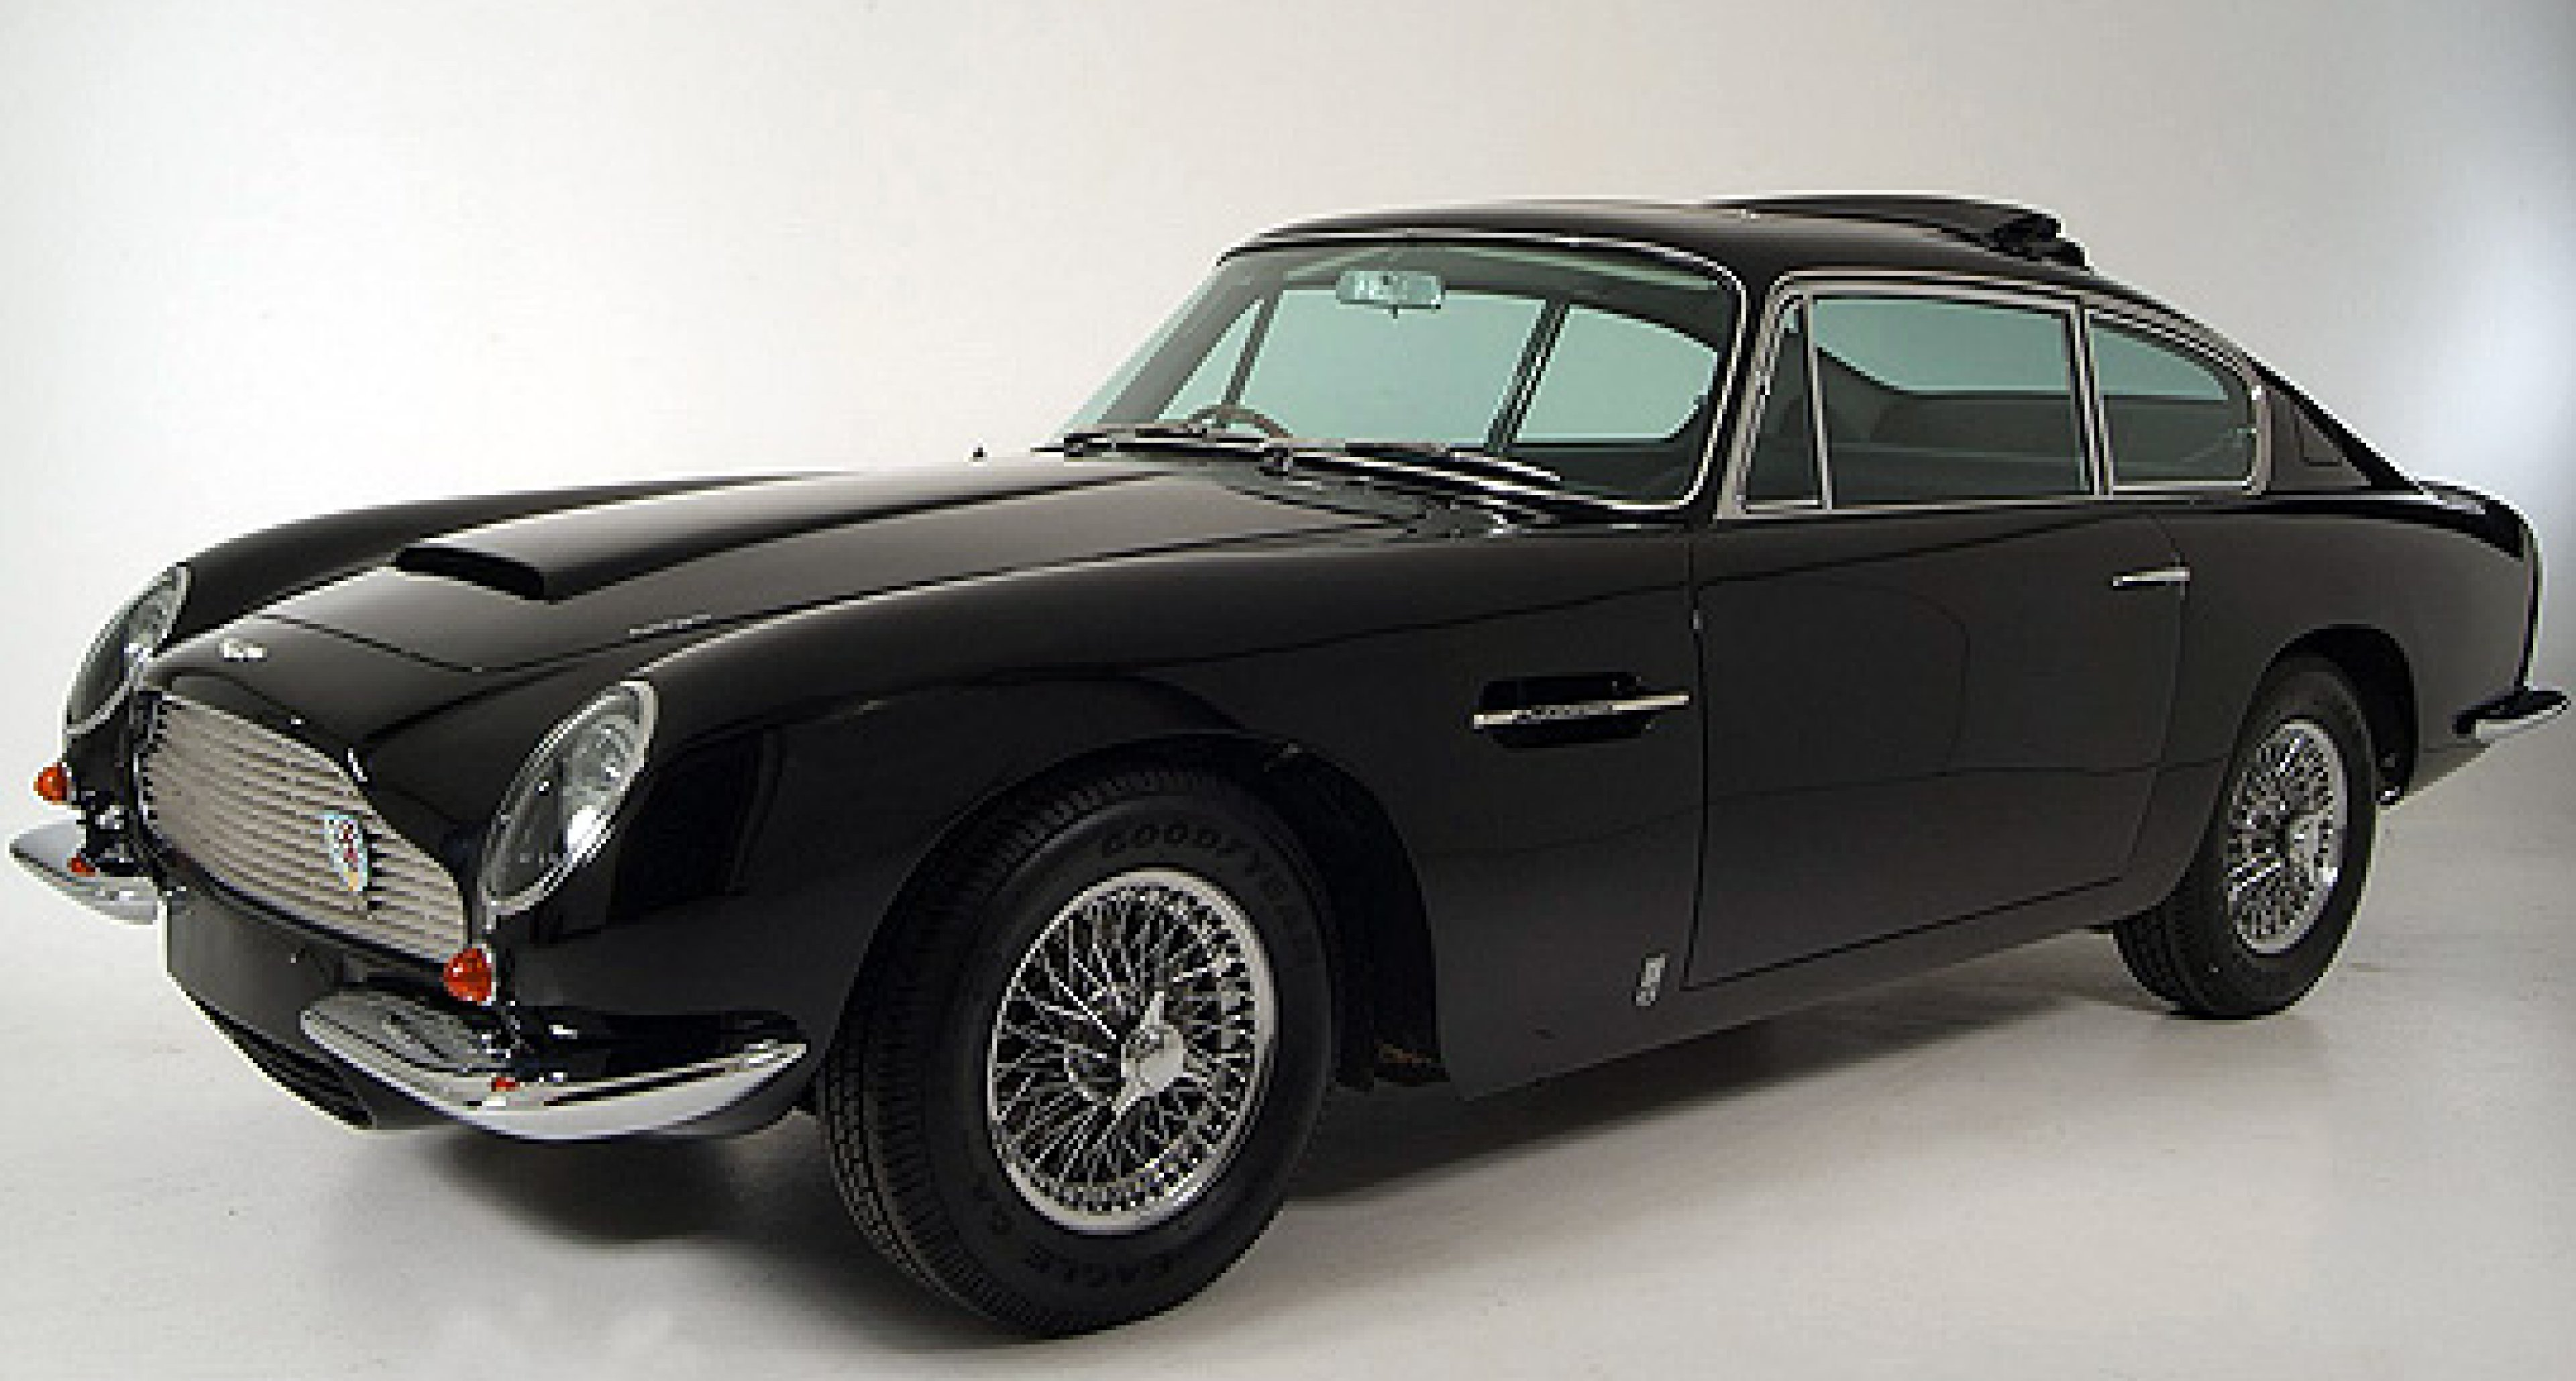 Oldtimer Galerie Toffen versteigert 100 klassische Fahrzeuge